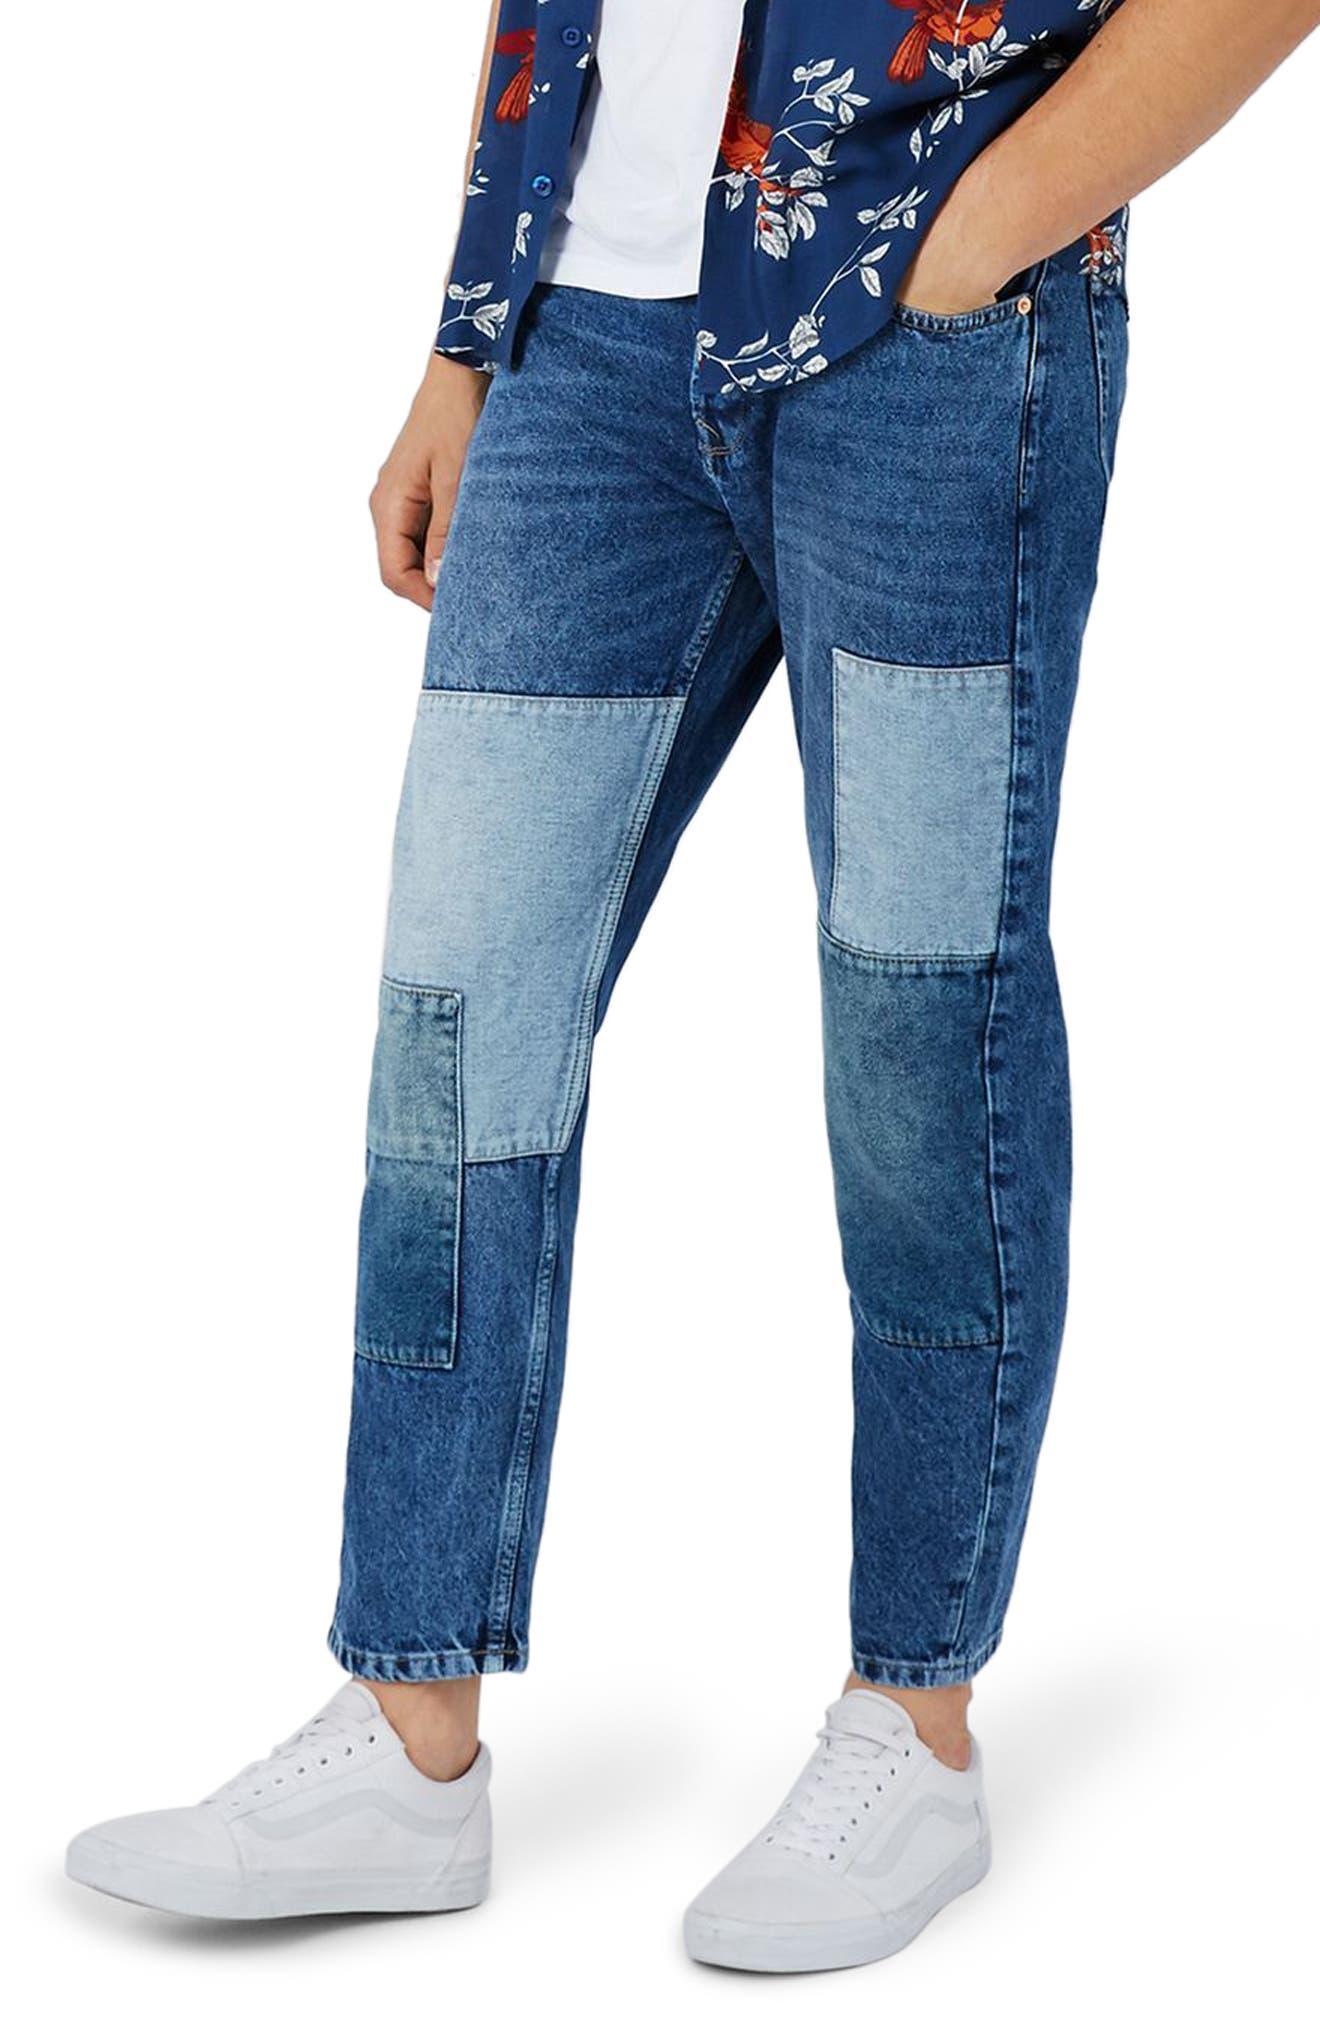 Topman Jigsaw Patch Original Fit Jeans